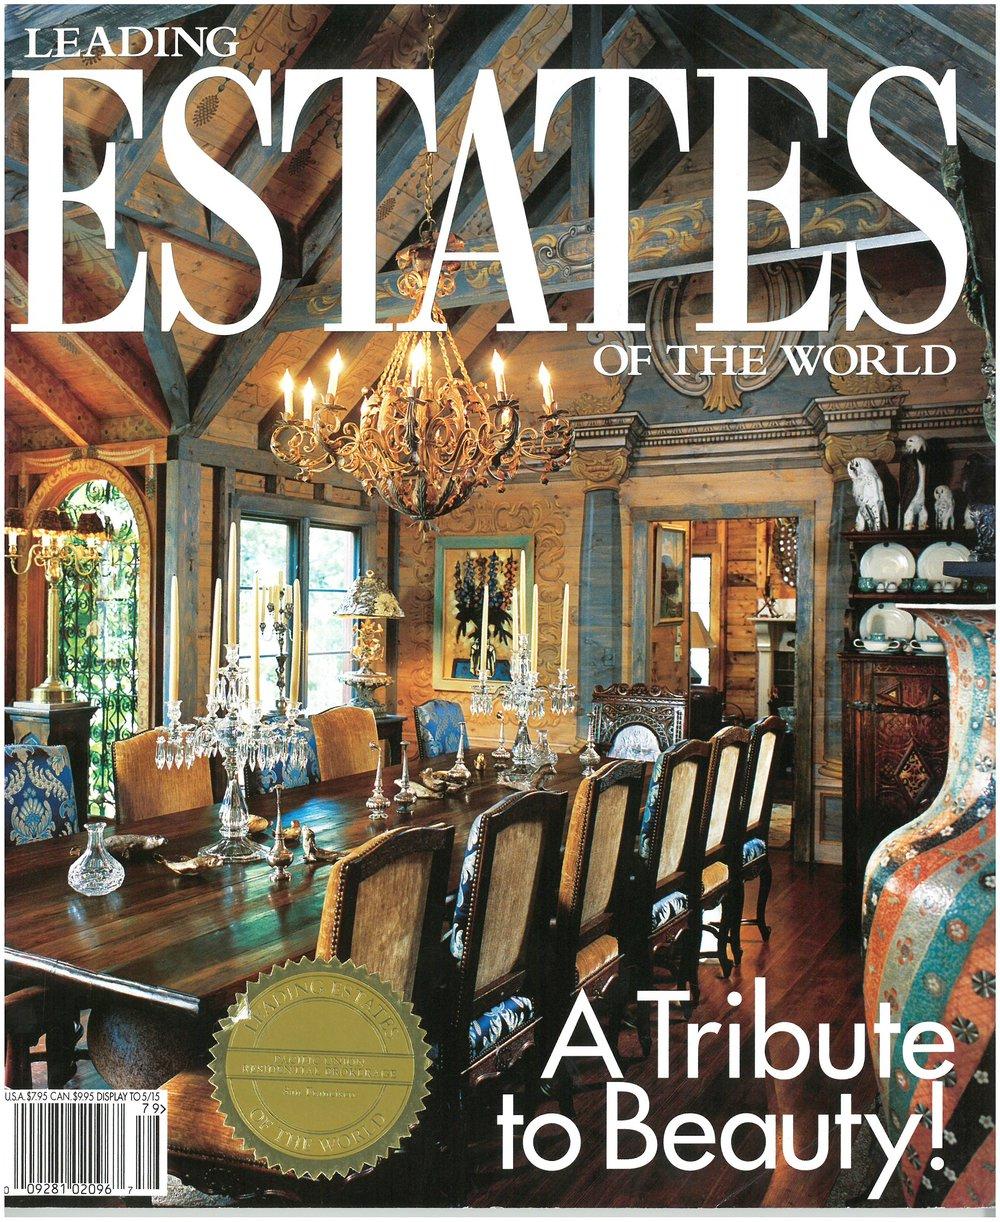 Leading Estates 2002 COVER.jpg